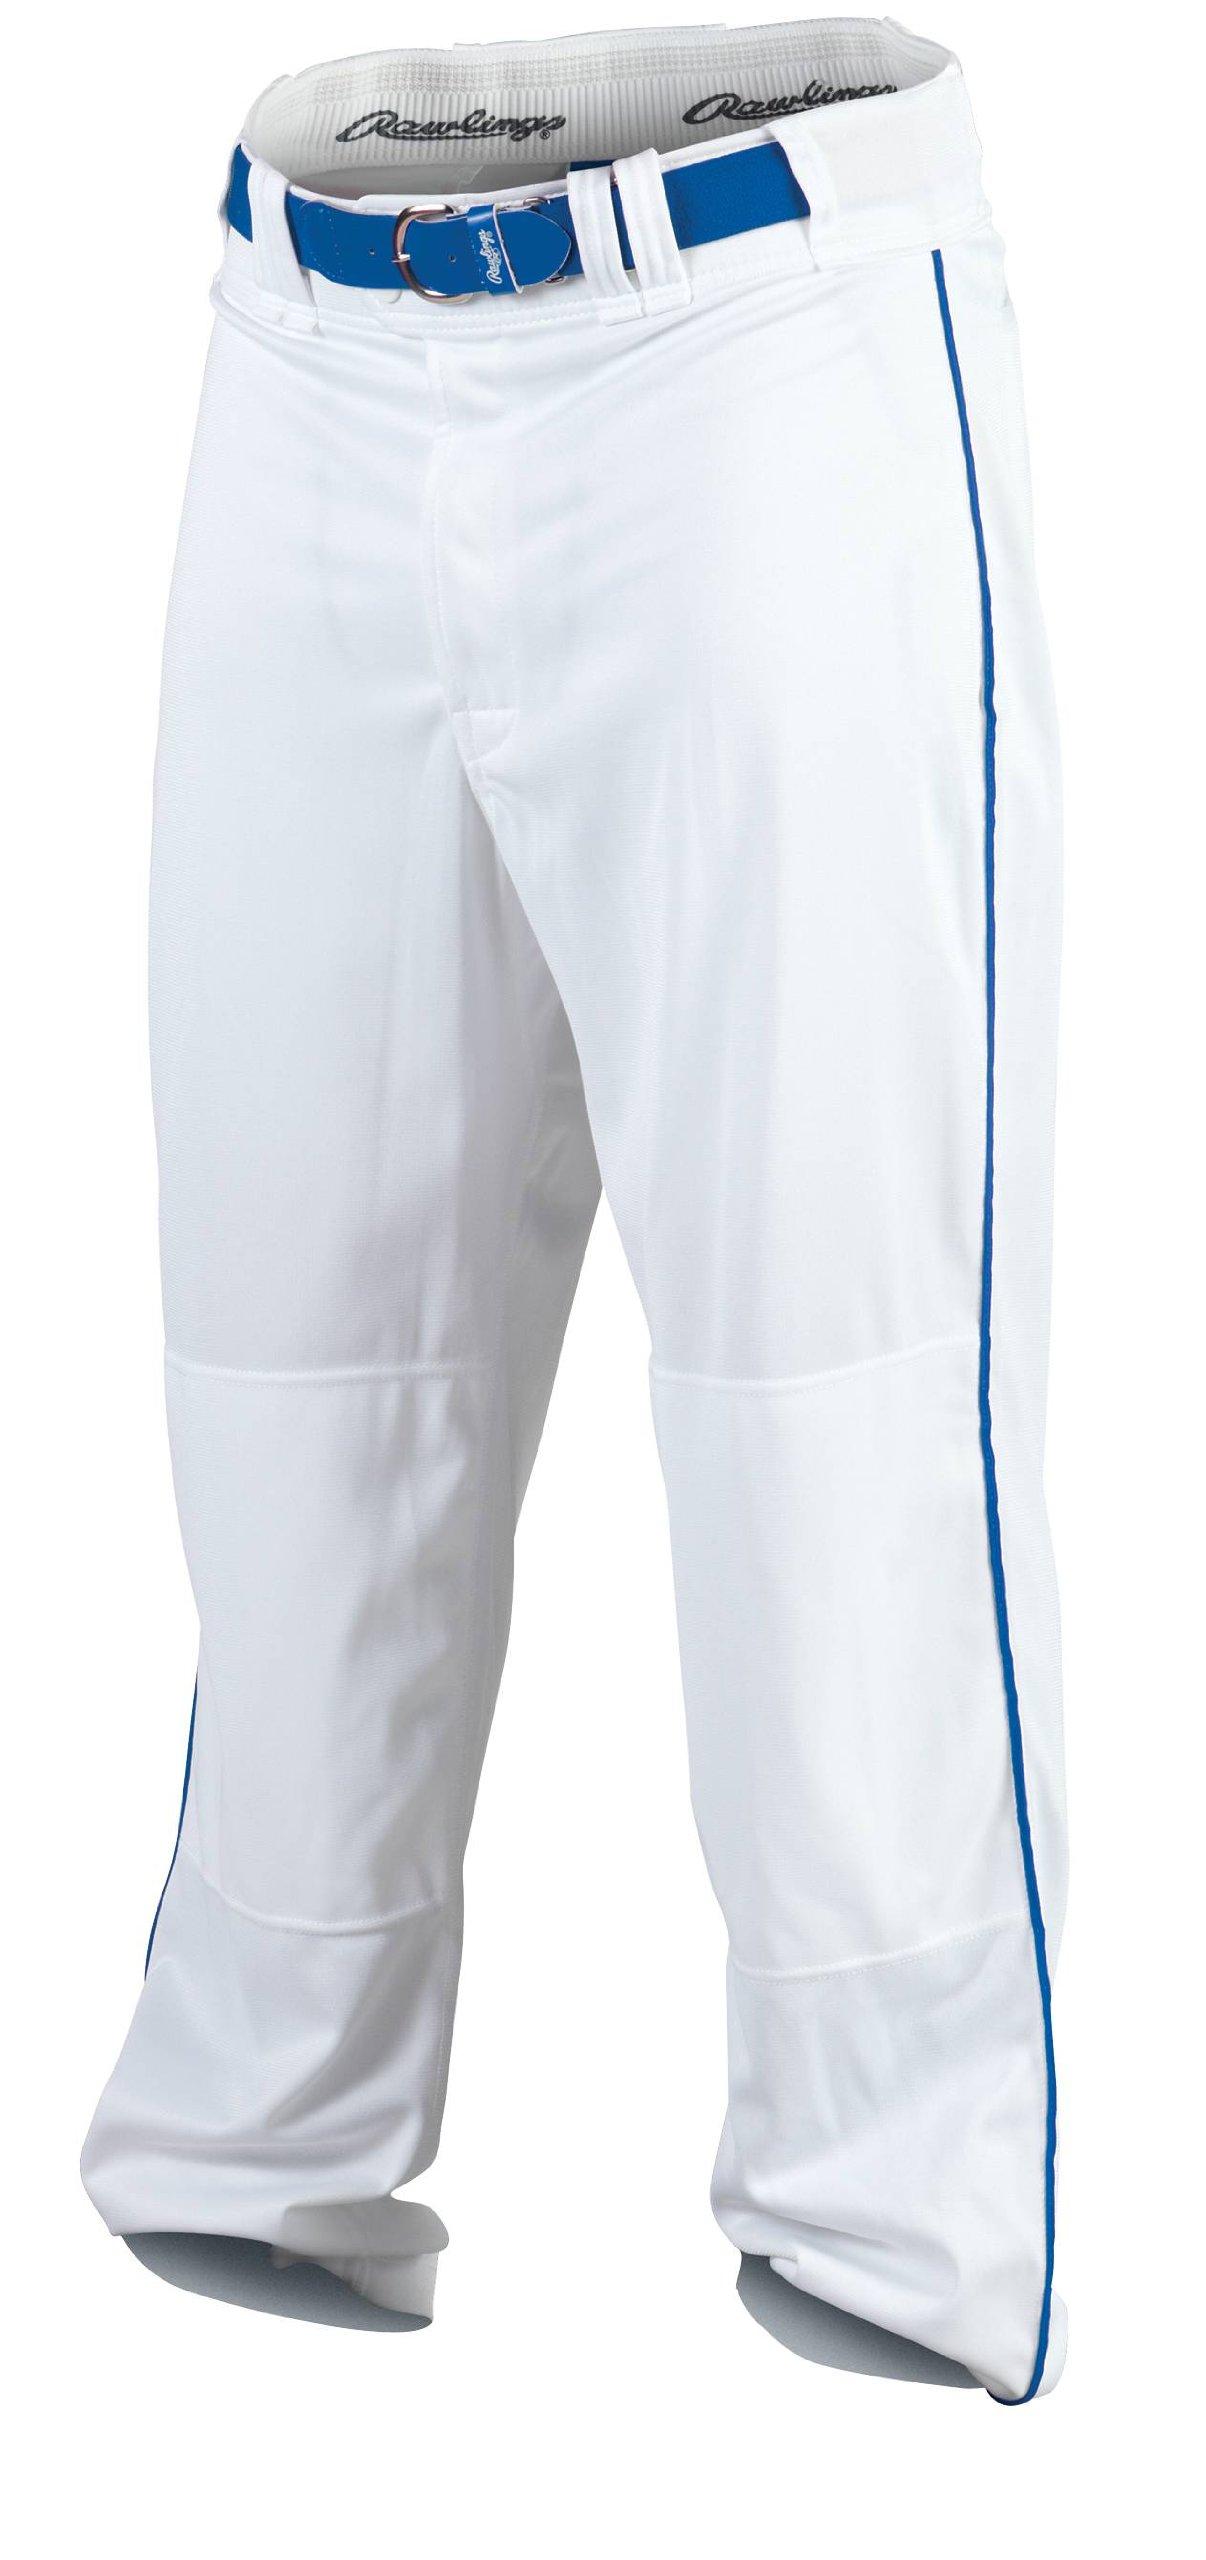 Rawlings Youth Baseball Pant (White/Royal, Large) by Rawlings